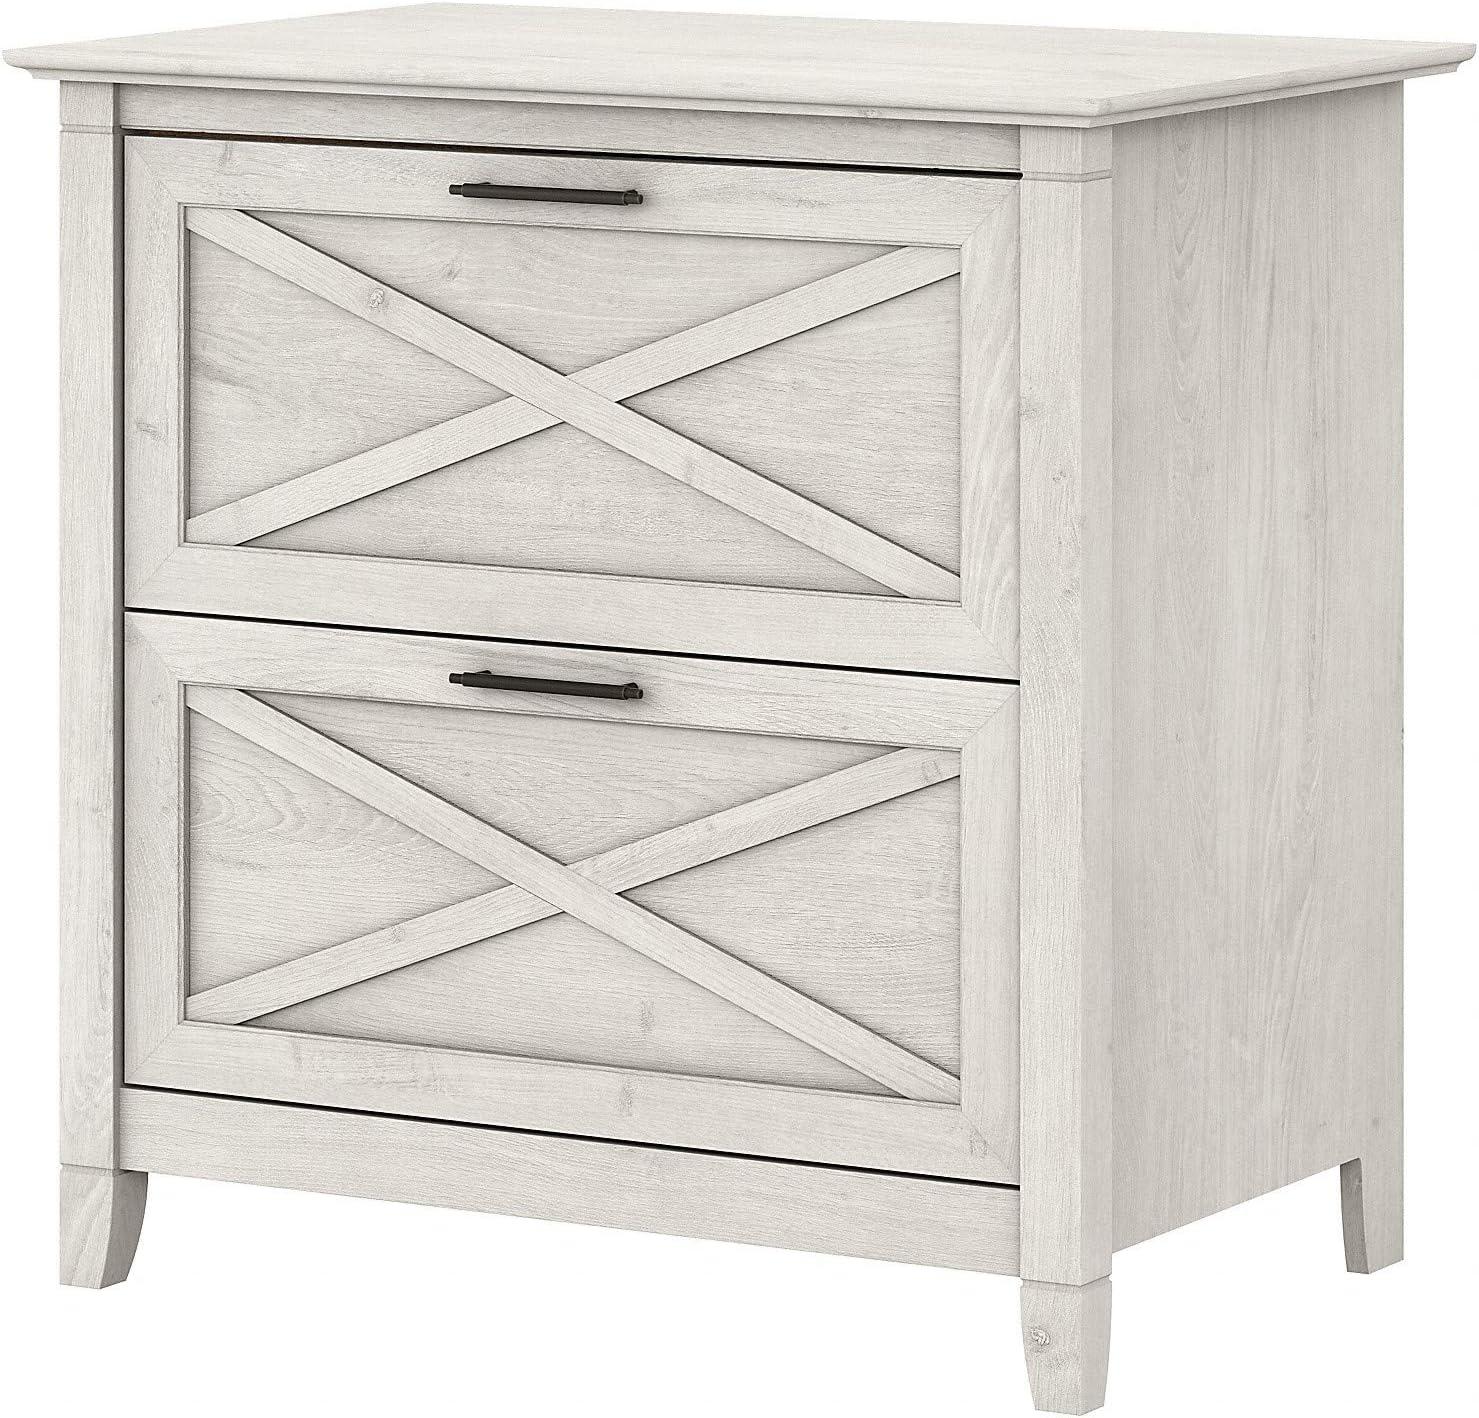 Bush Furniture Key West 2 Drawer Lateral File Cabinet, Linen White Oak